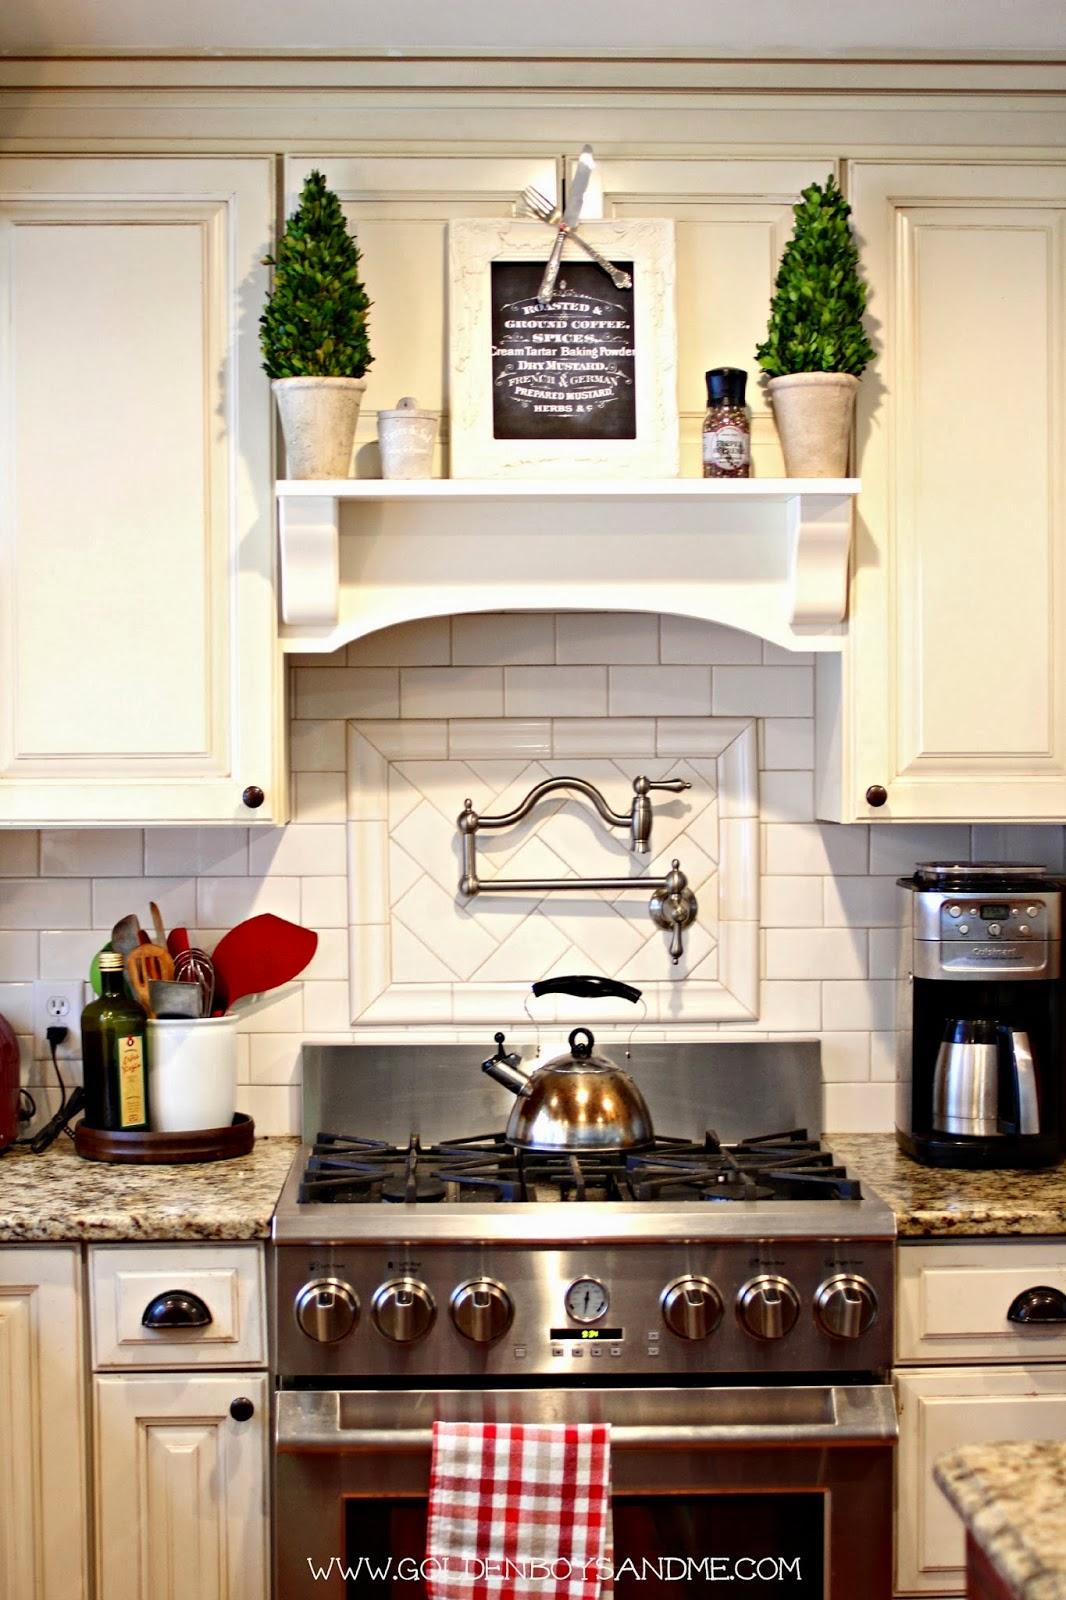 Golden Boys and Me Summer Home Tour : kitchen8 from www.goldenboysandme.com size 1066 x 1600 jpeg 274kB